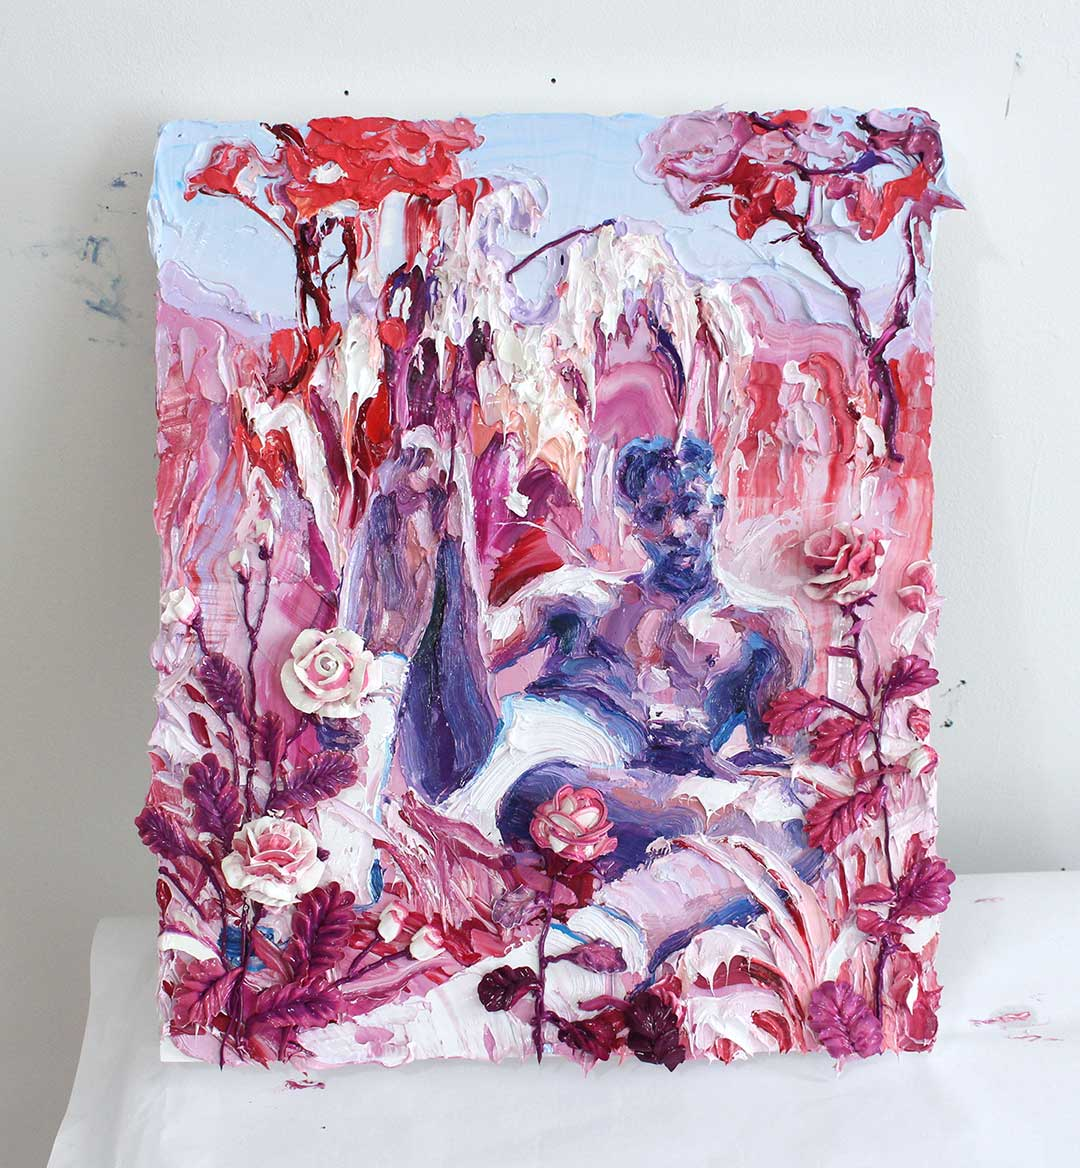 Rose Emoji. Oil on canvas. 16x24